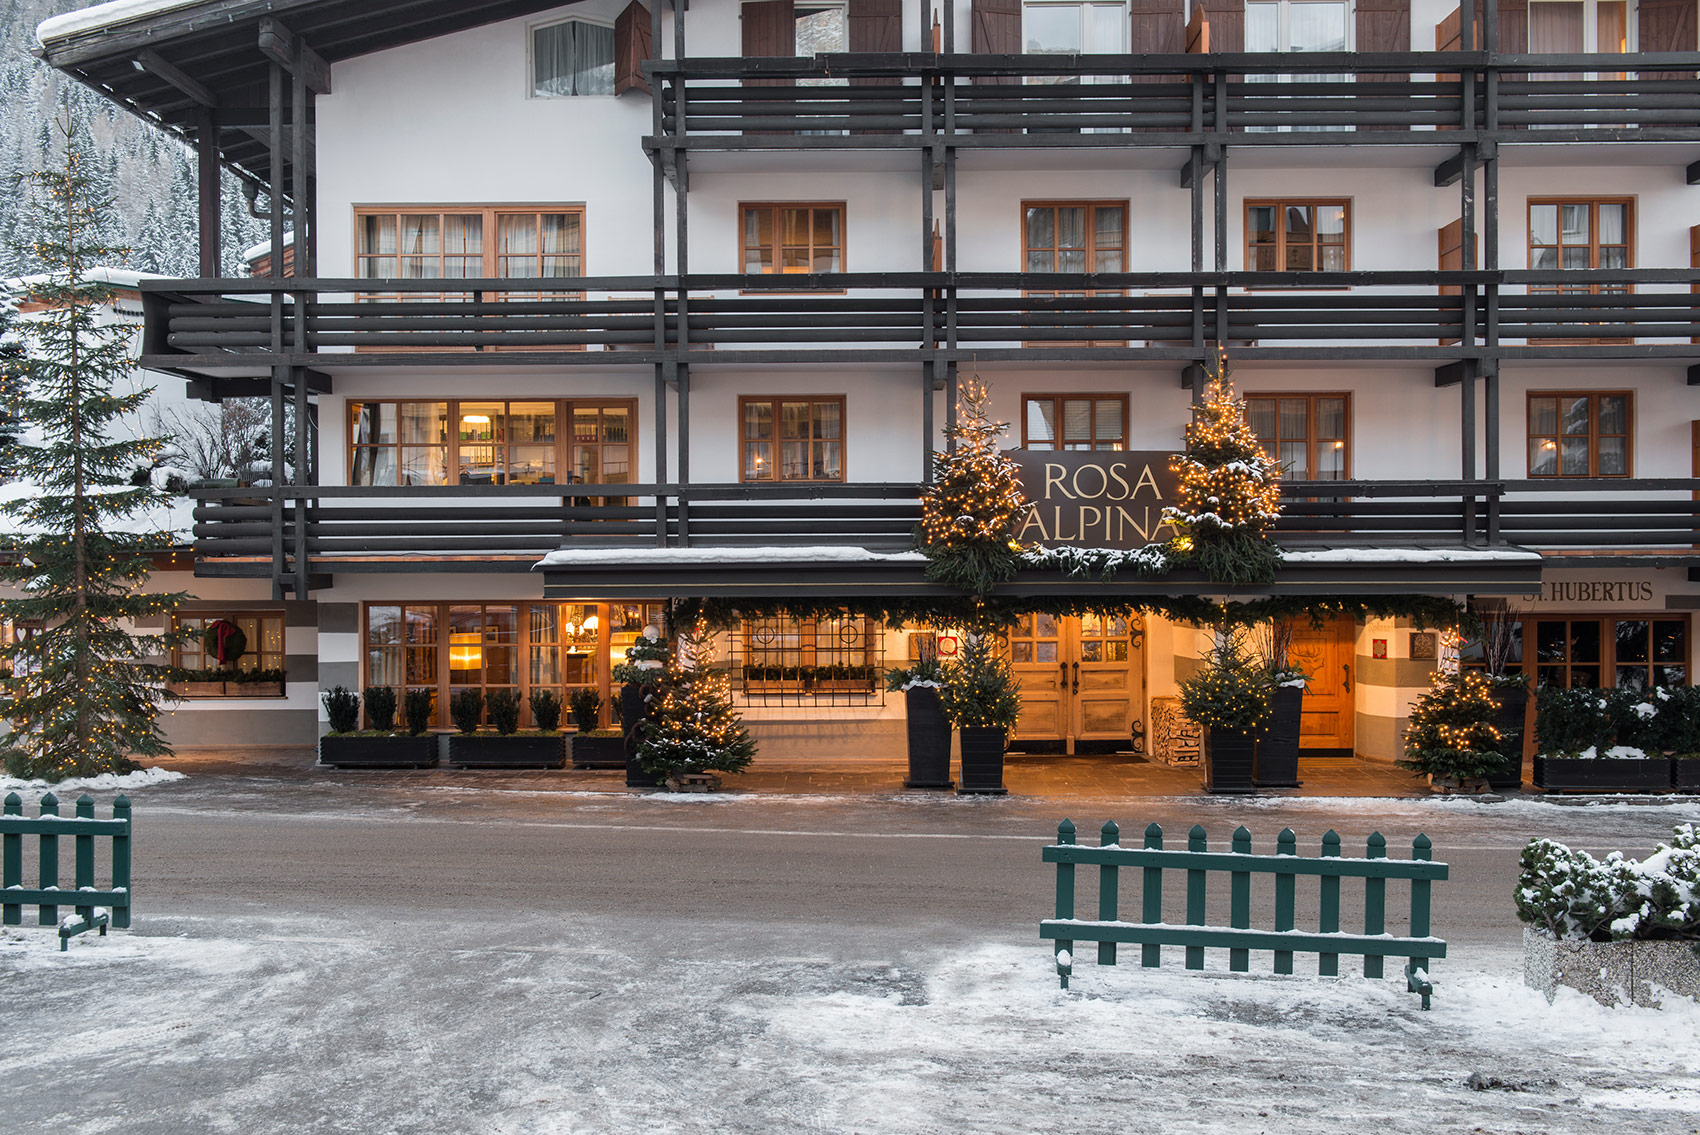 Rosa Alpina Hotel Spa - Hotel and spa rosa alpina